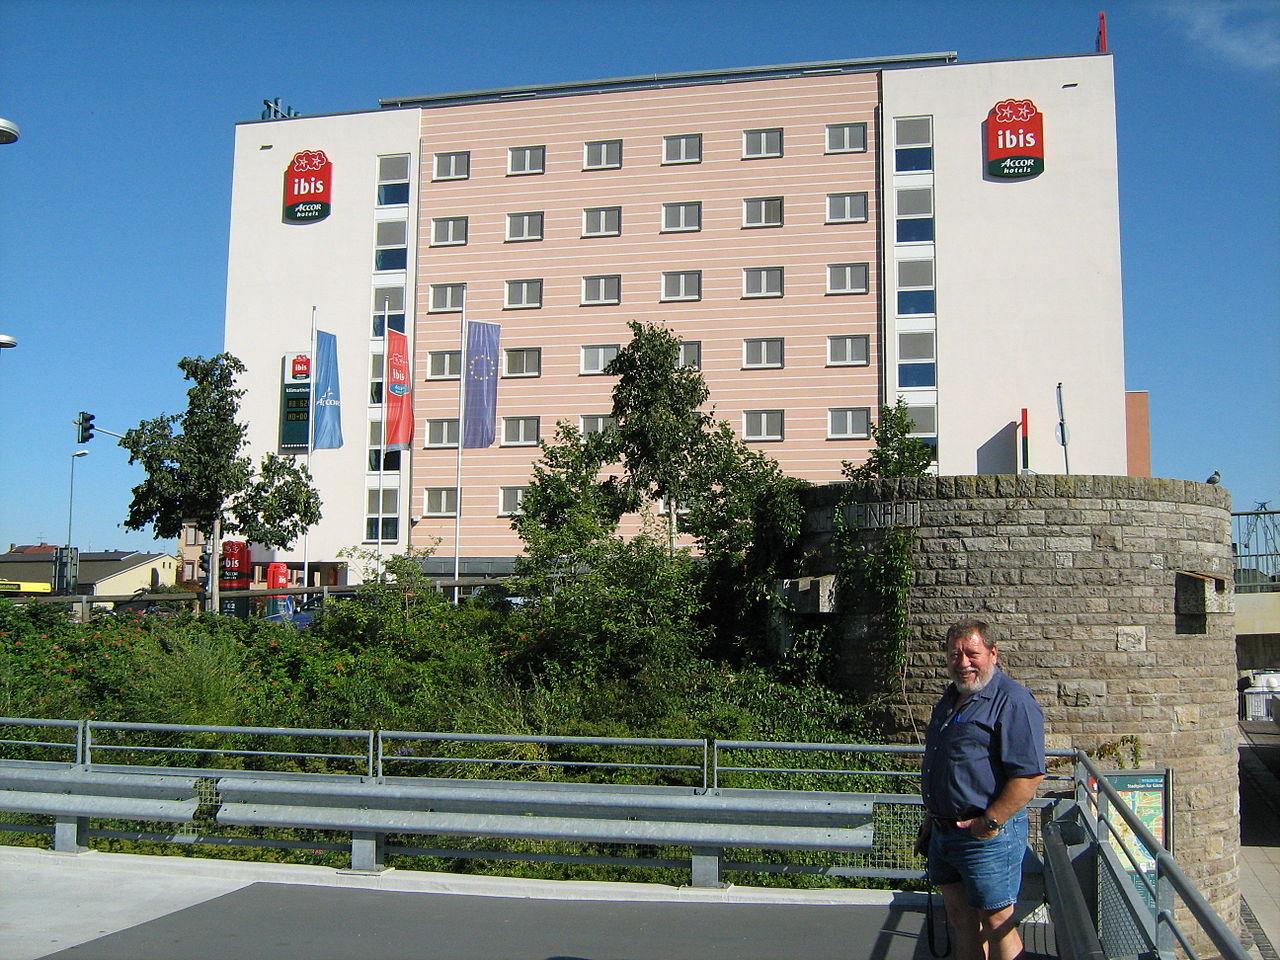 Hotel Ibis W Nisterlode E A